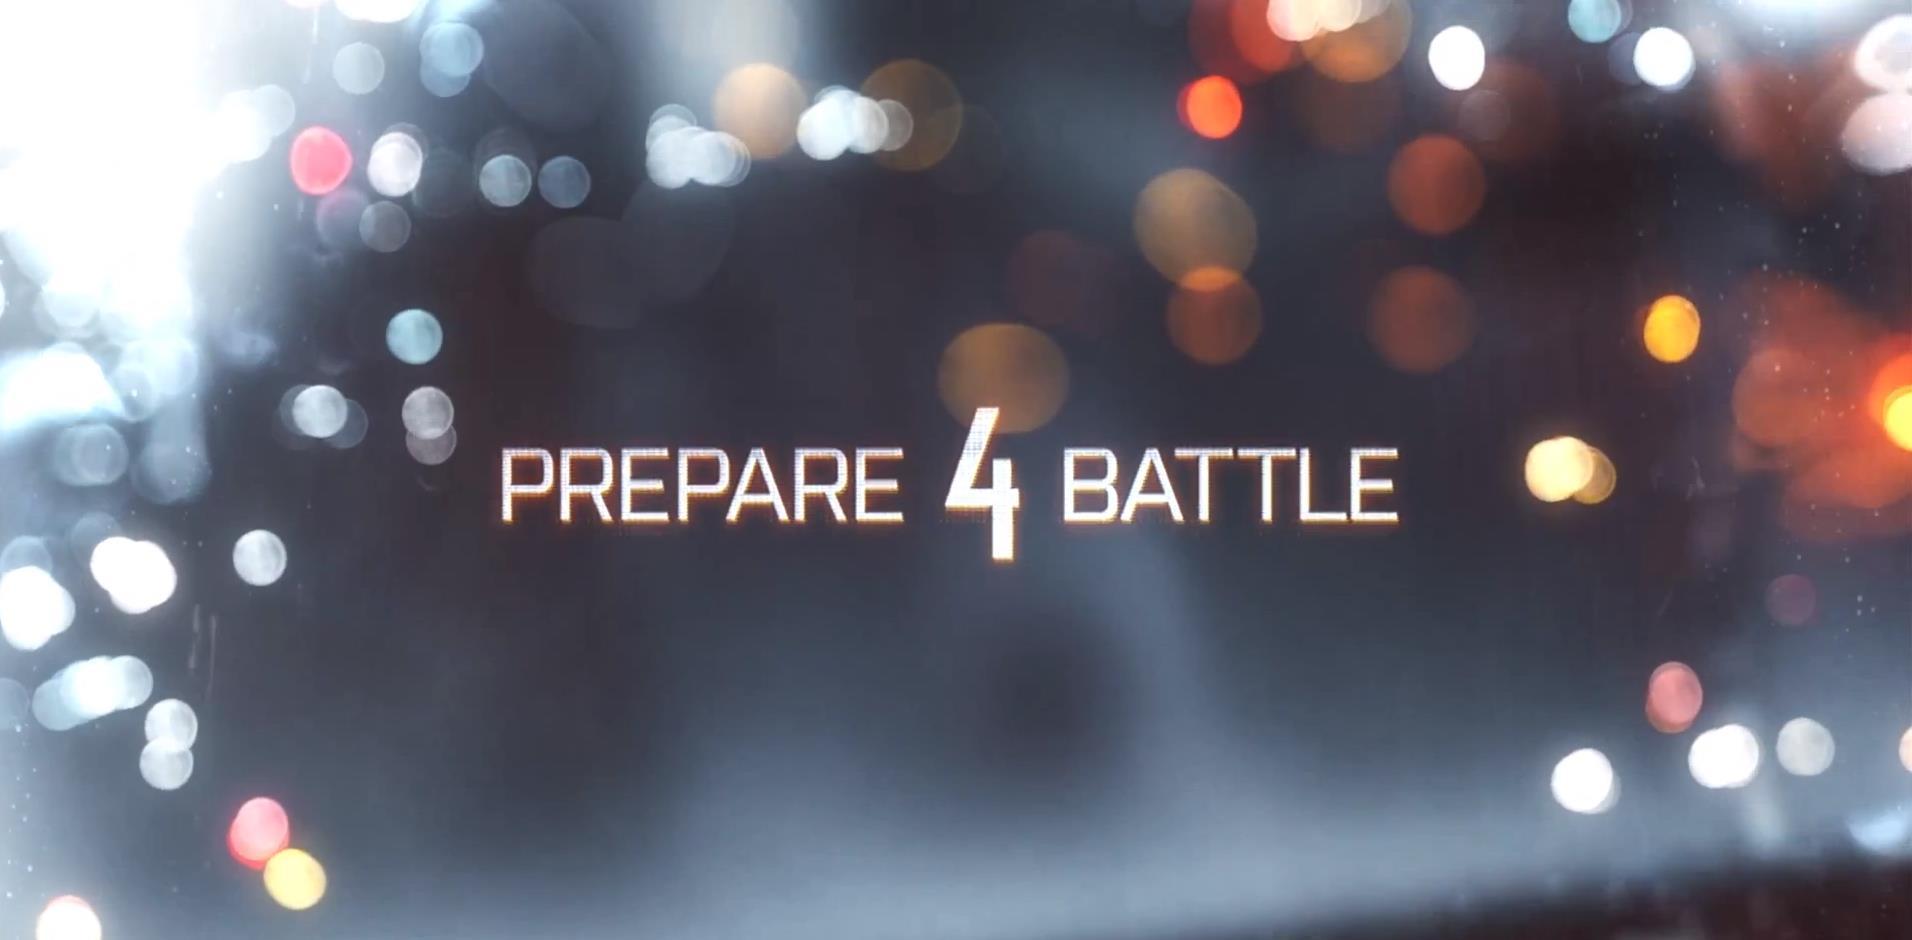 Battlefield 4 Battle Wallpaper